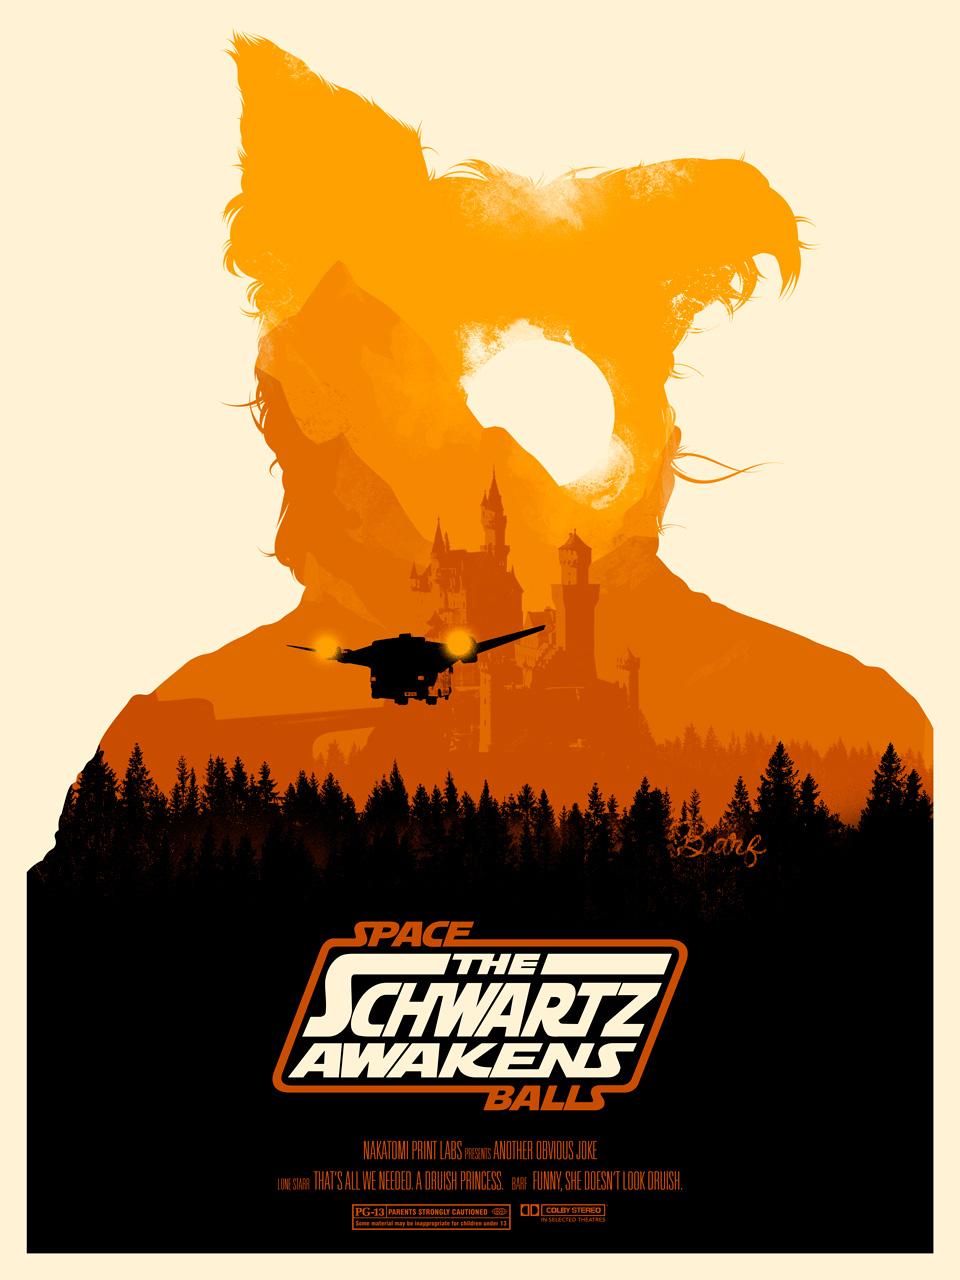 amusing-spaceballs-the-schwartz-awakens-poster-art-series3